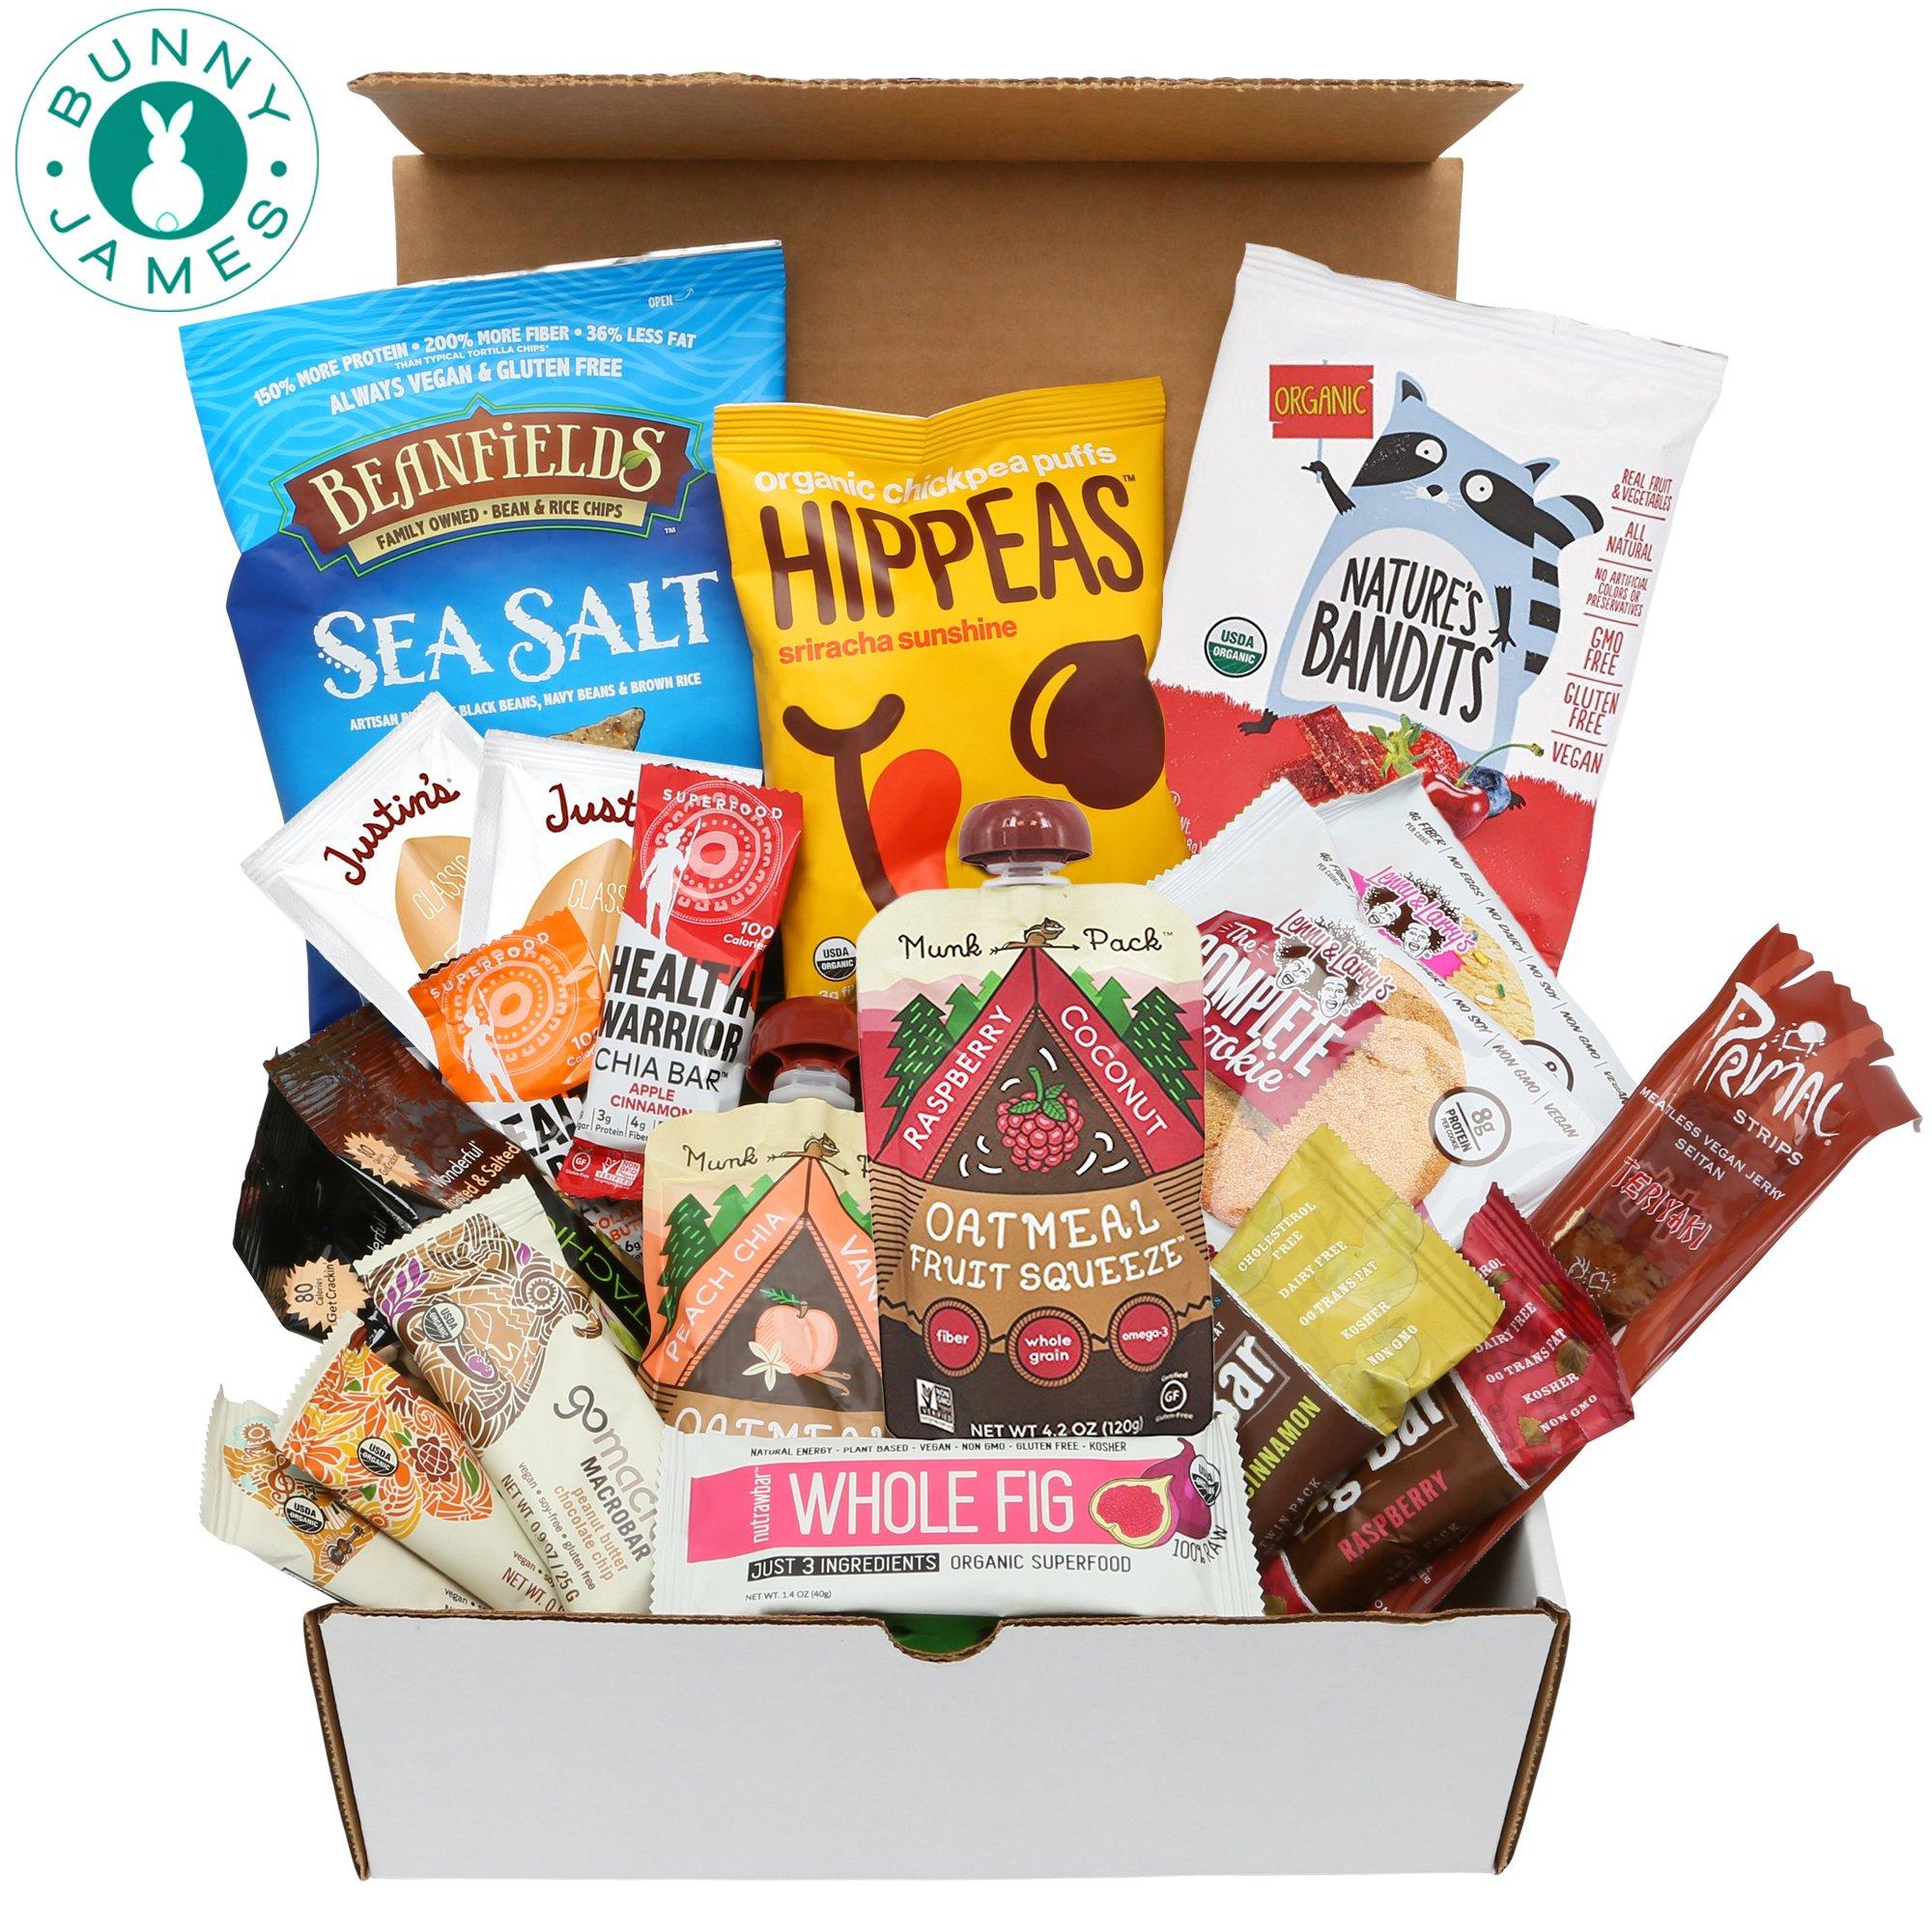 Healthy Vegan Snacks Care Package: Natural, Organic, Non-GMO, Vegan Cookies, Protein Bars, Fruit Snacks, Vegan Jerky, Chips, Nuts, Premium Assortment Vegan Gift Box